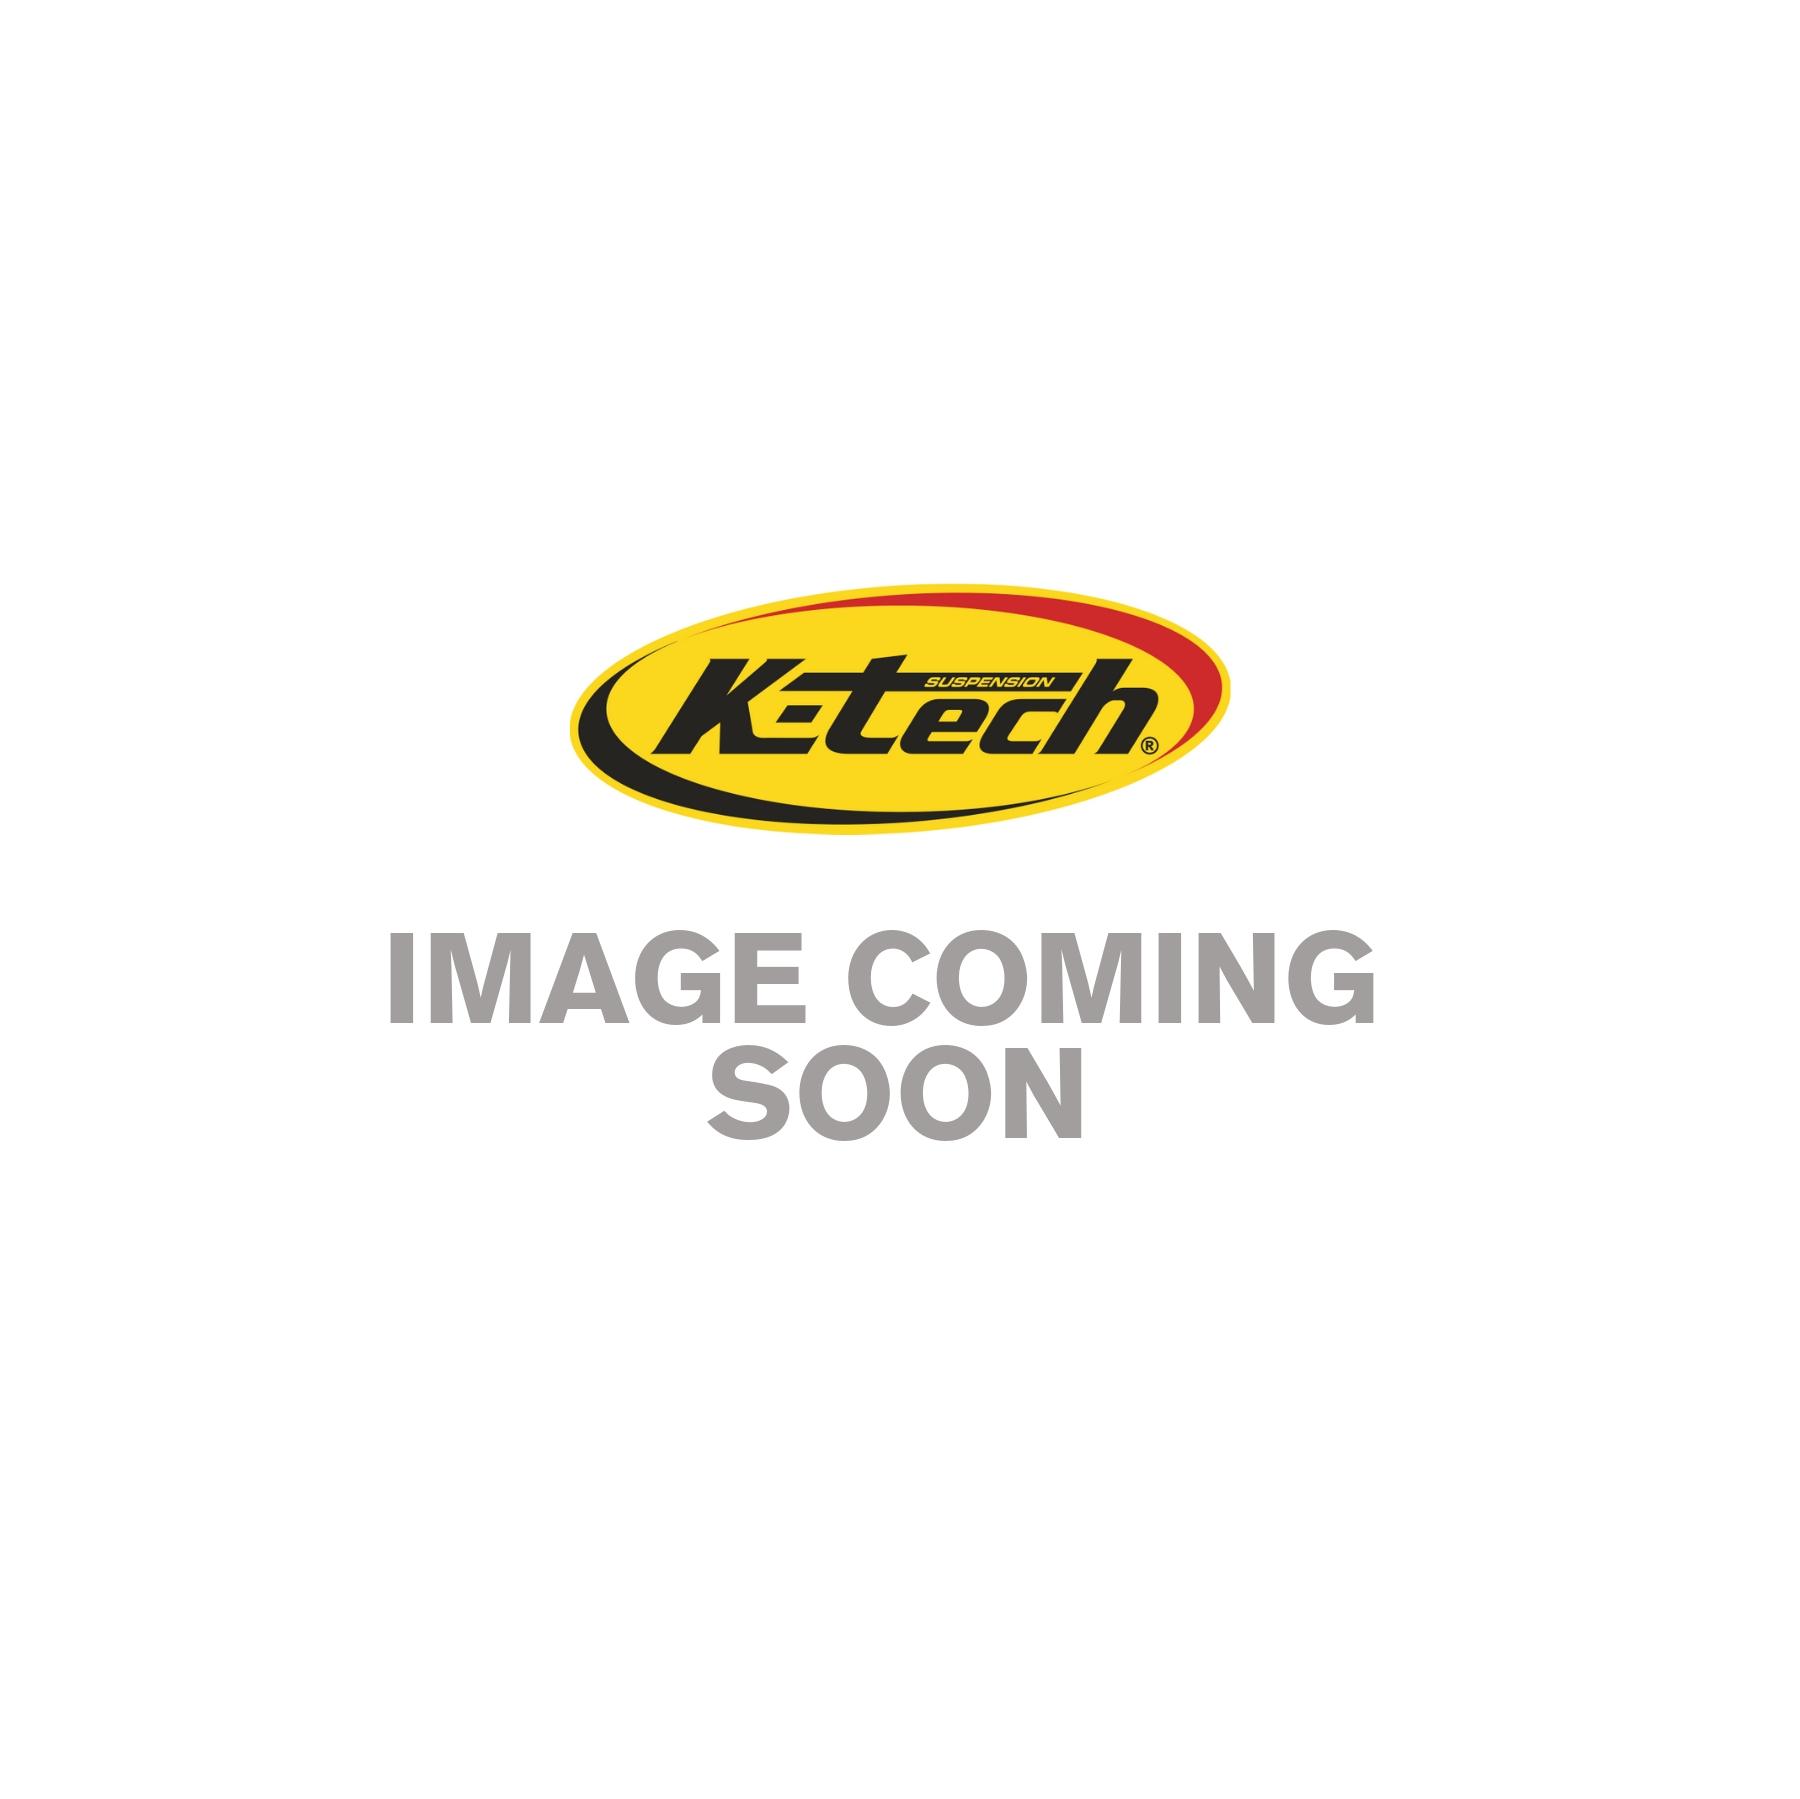 Gedore 57mm Friction Rachet Insert 47mm (WP Shocks KTM 50/65SX HVA TC50/65)